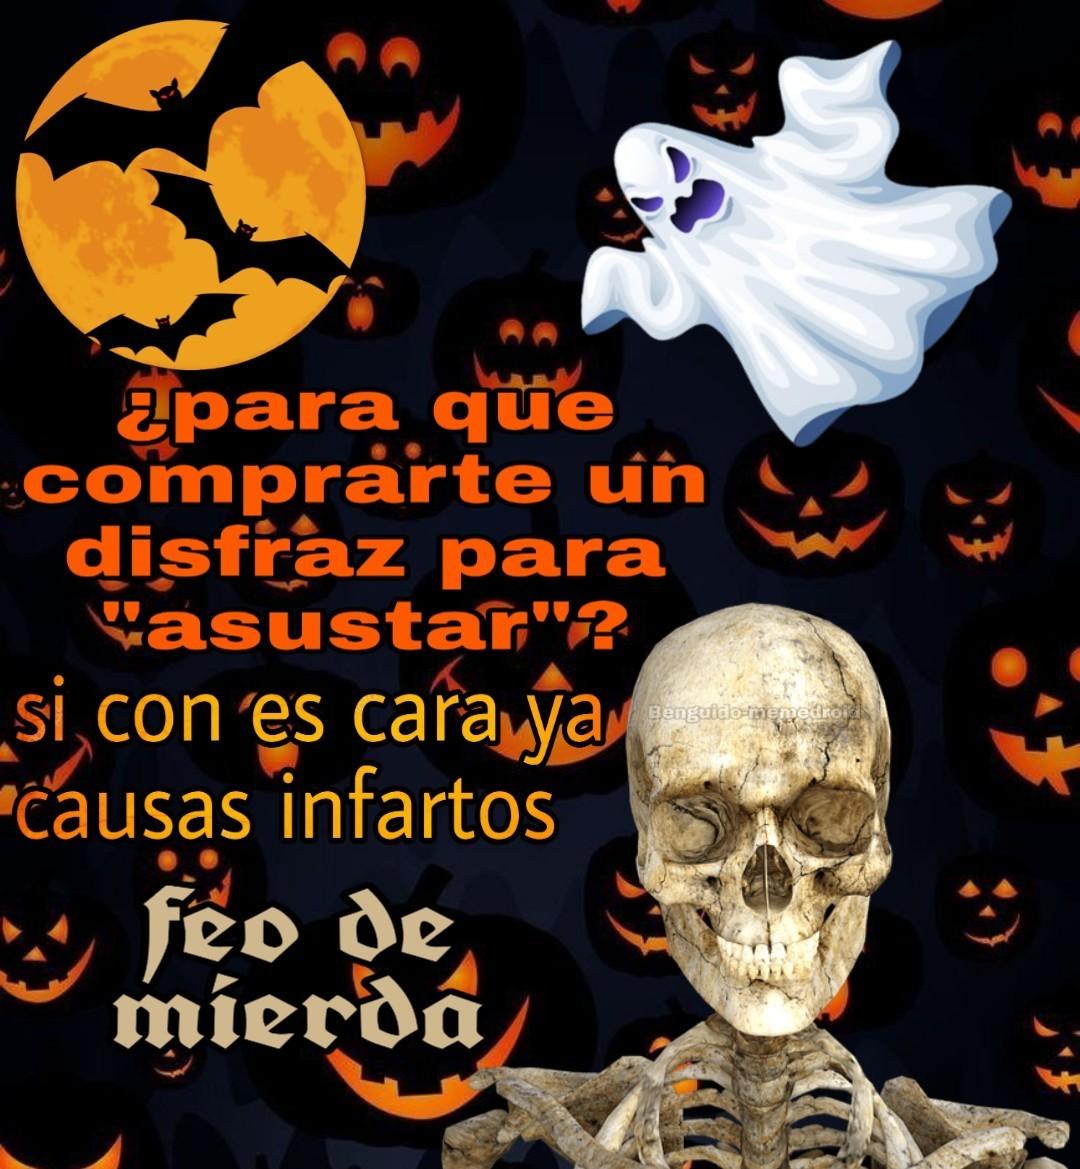 Este Halloween anda sin disfraz, feo de mierda - meme